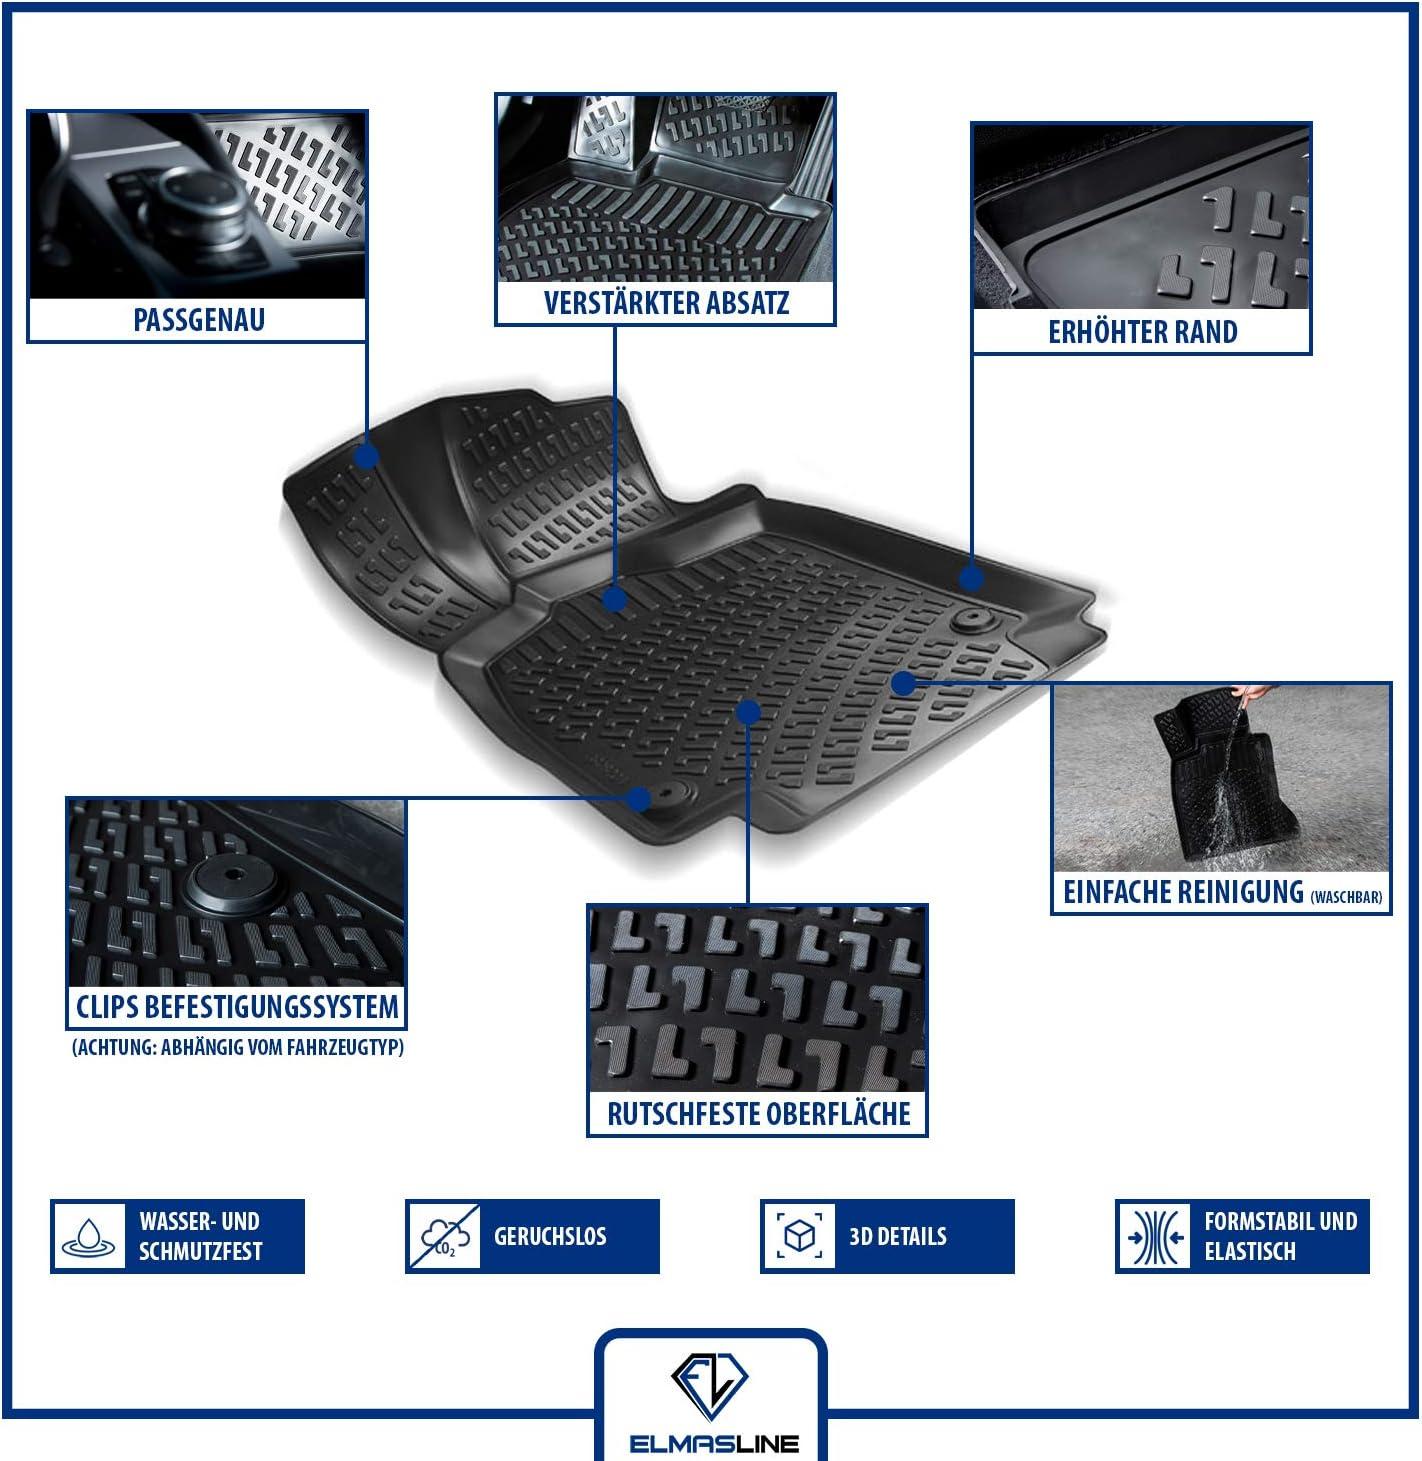 I 2008-2012 Elmasline Design 3D Gummimatten Set f/ür Dacia SANDERO Extra hoher 5cm Rand